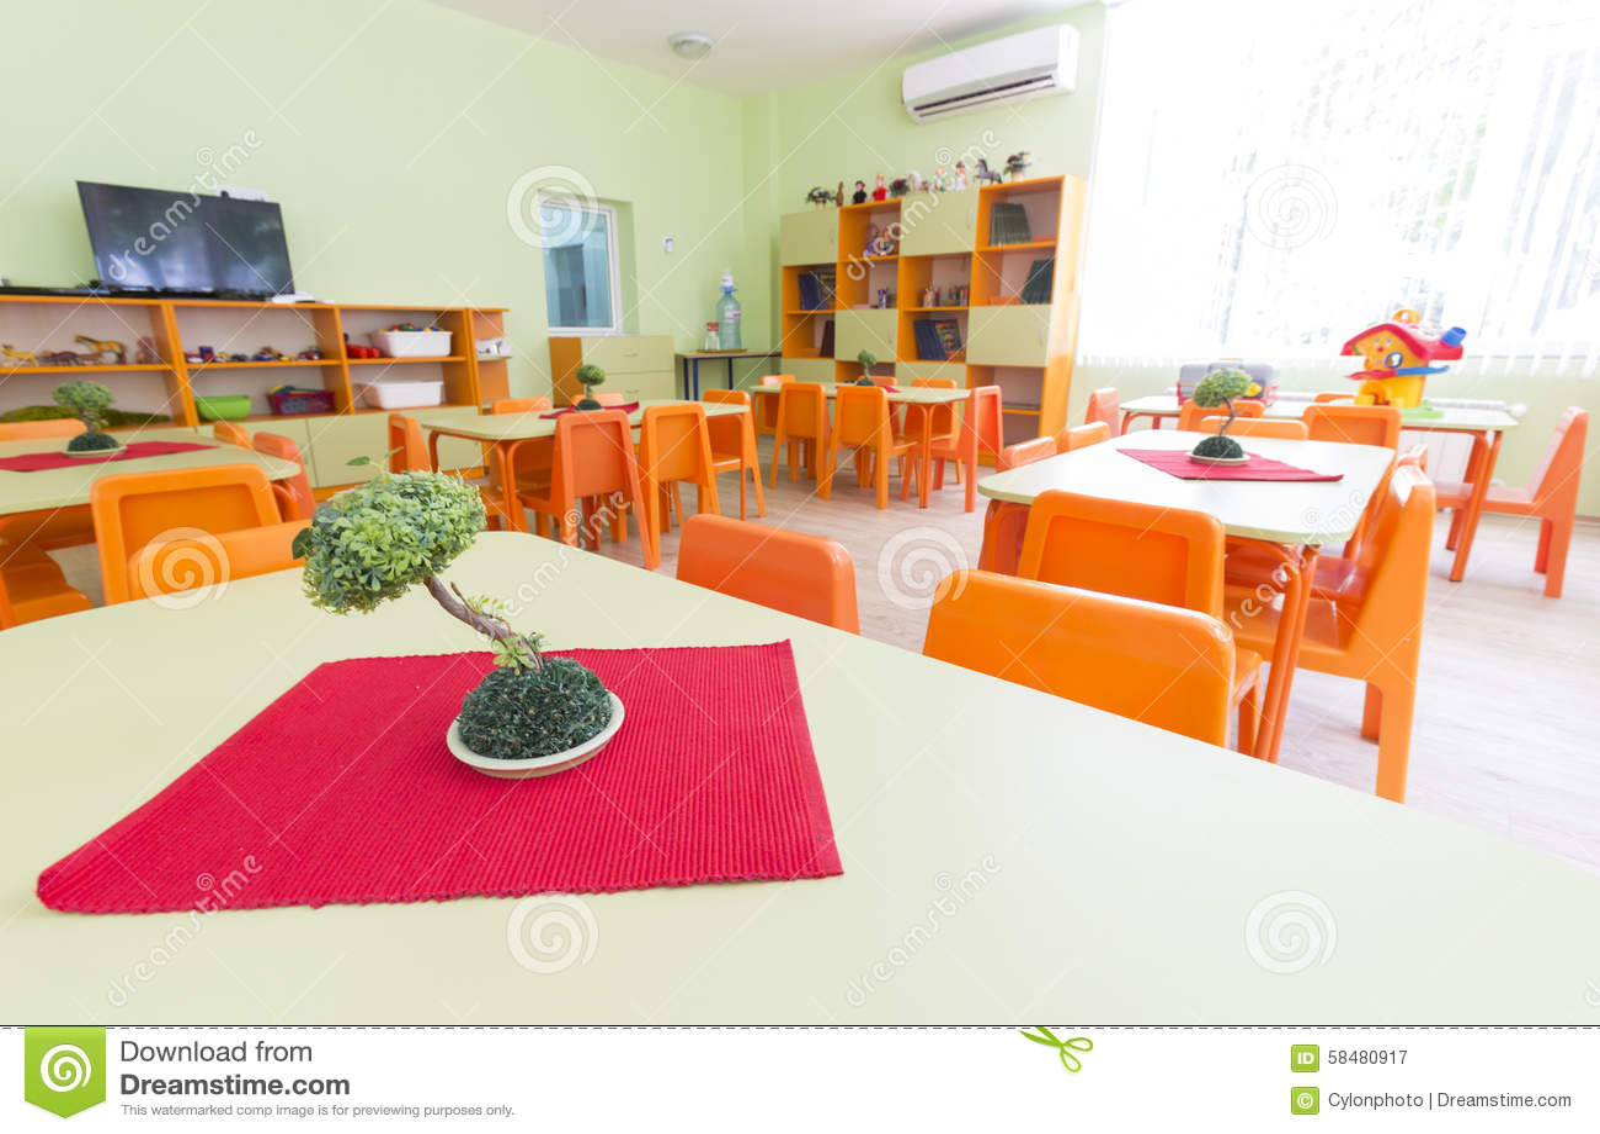 Kindergarten classroom table - Chairs Classroom Kids Kindergarten Small Tables